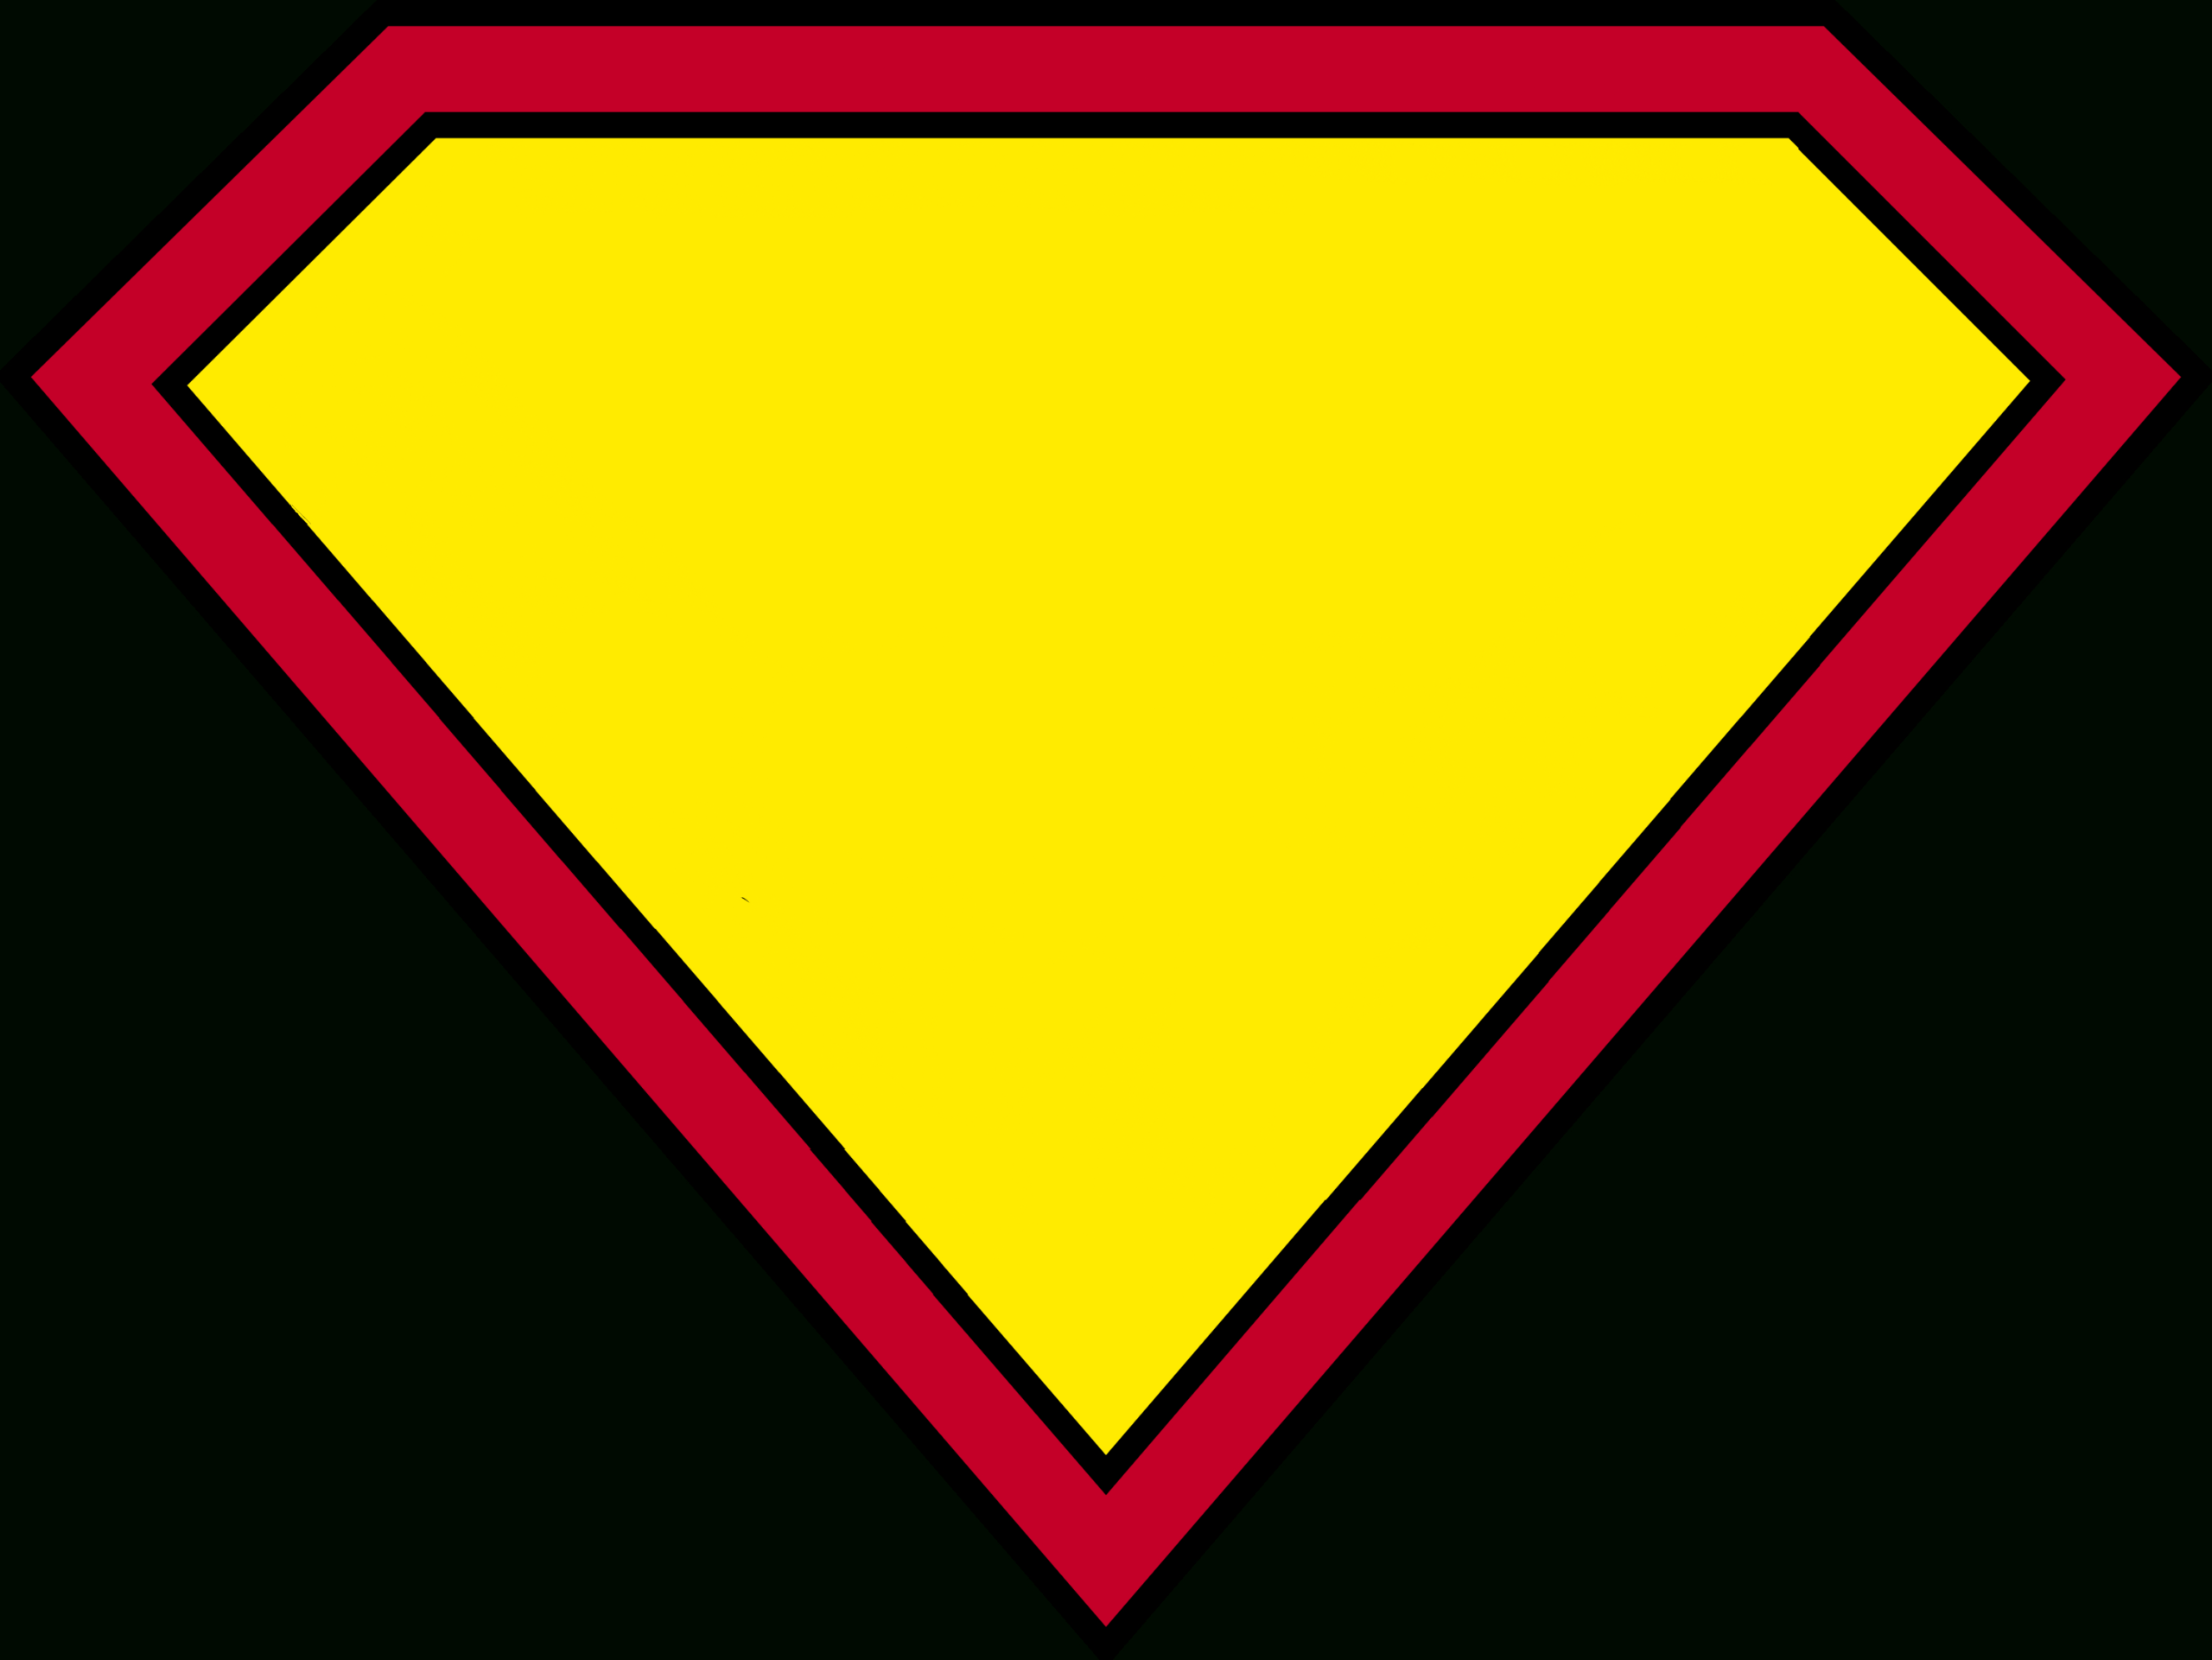 Blank Superman Logos Intended For Blank Superman Logo Template